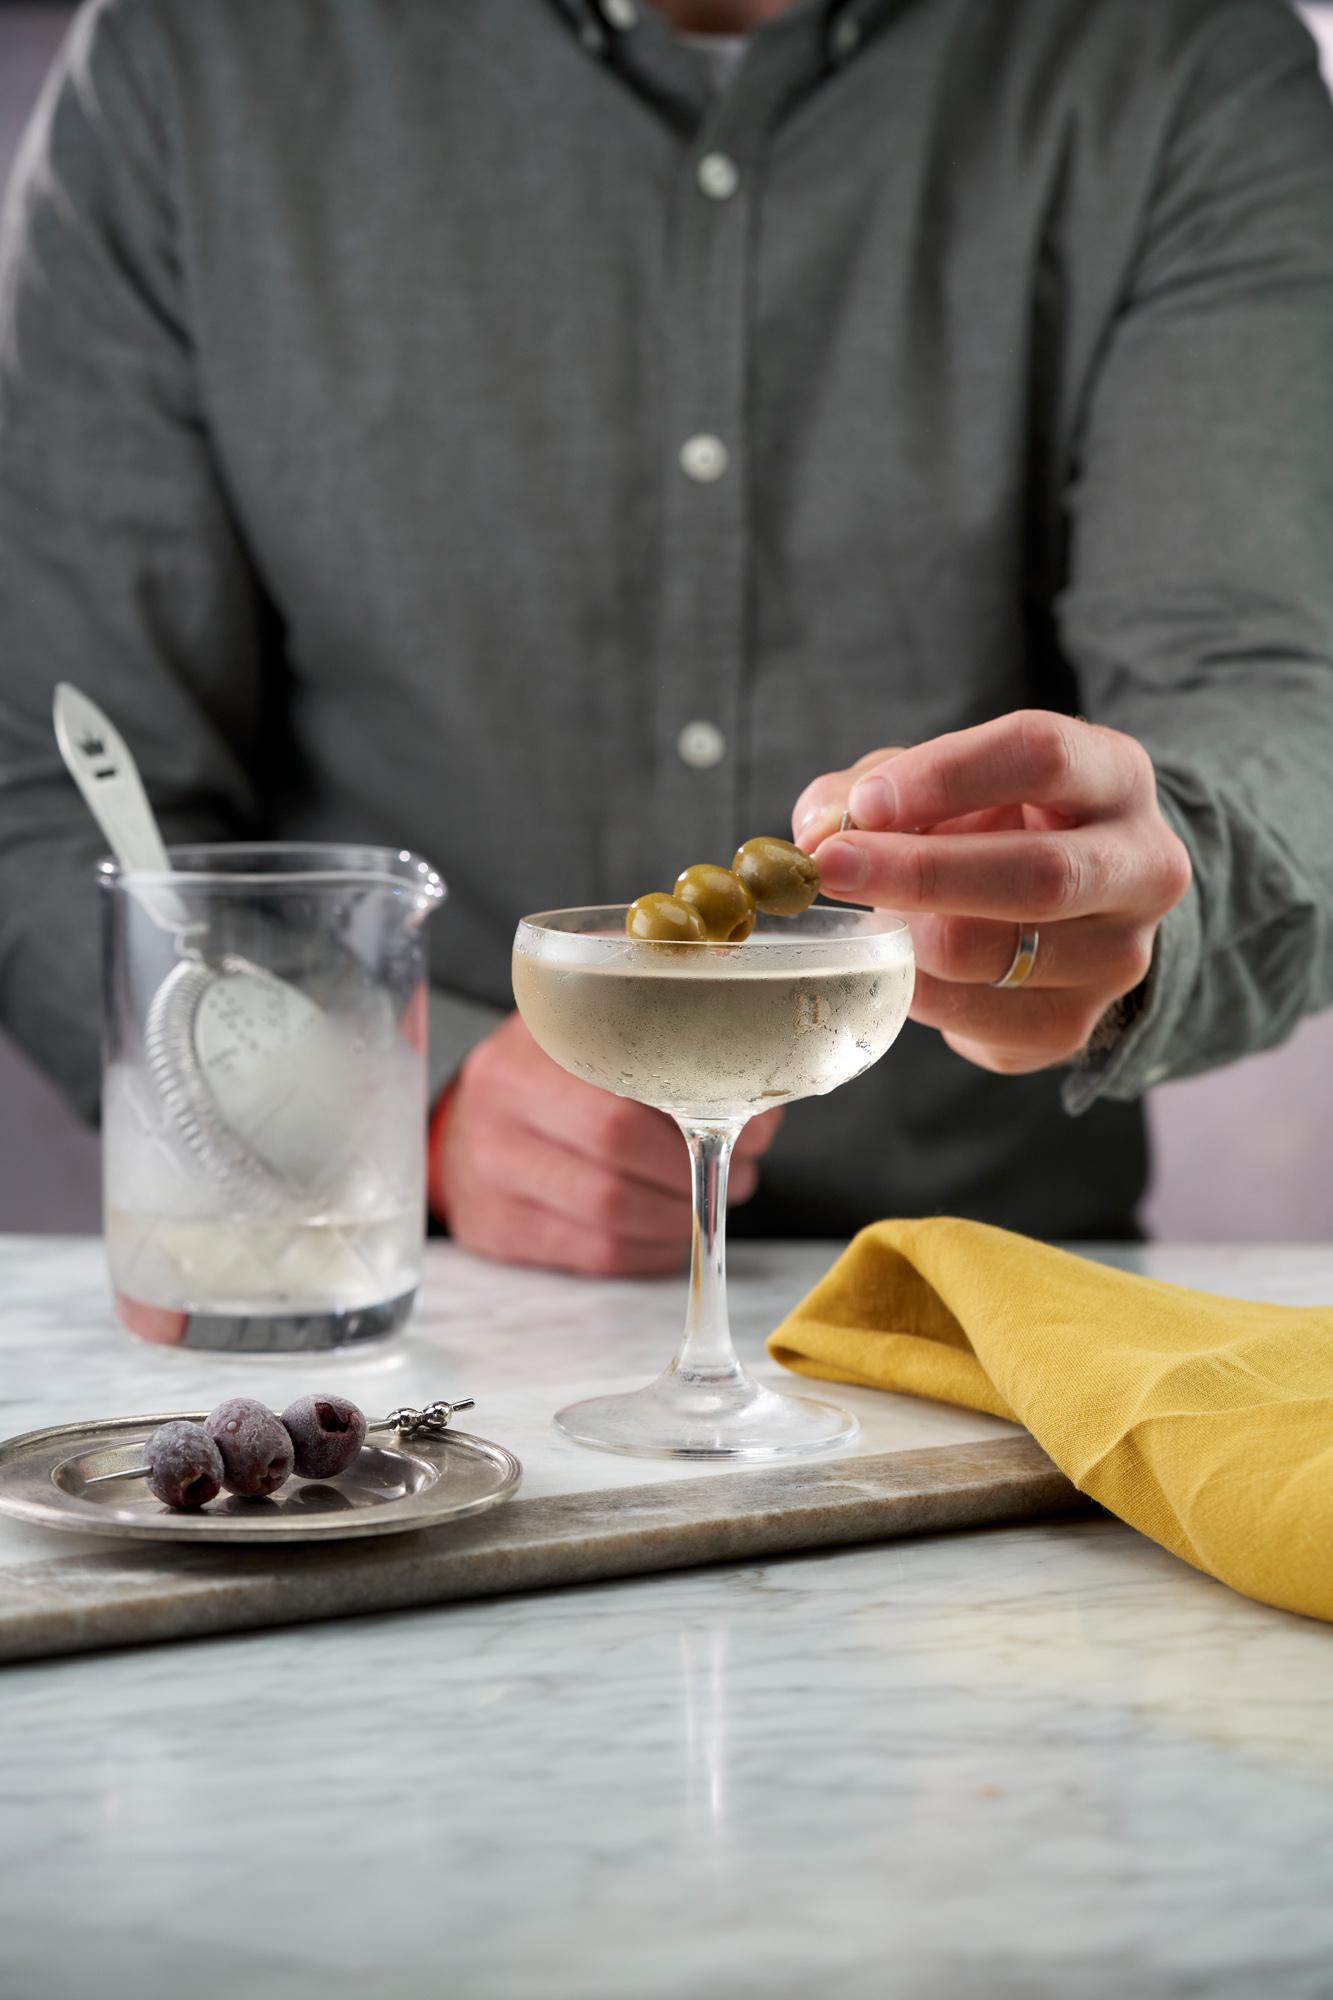 Martini garnished with olives